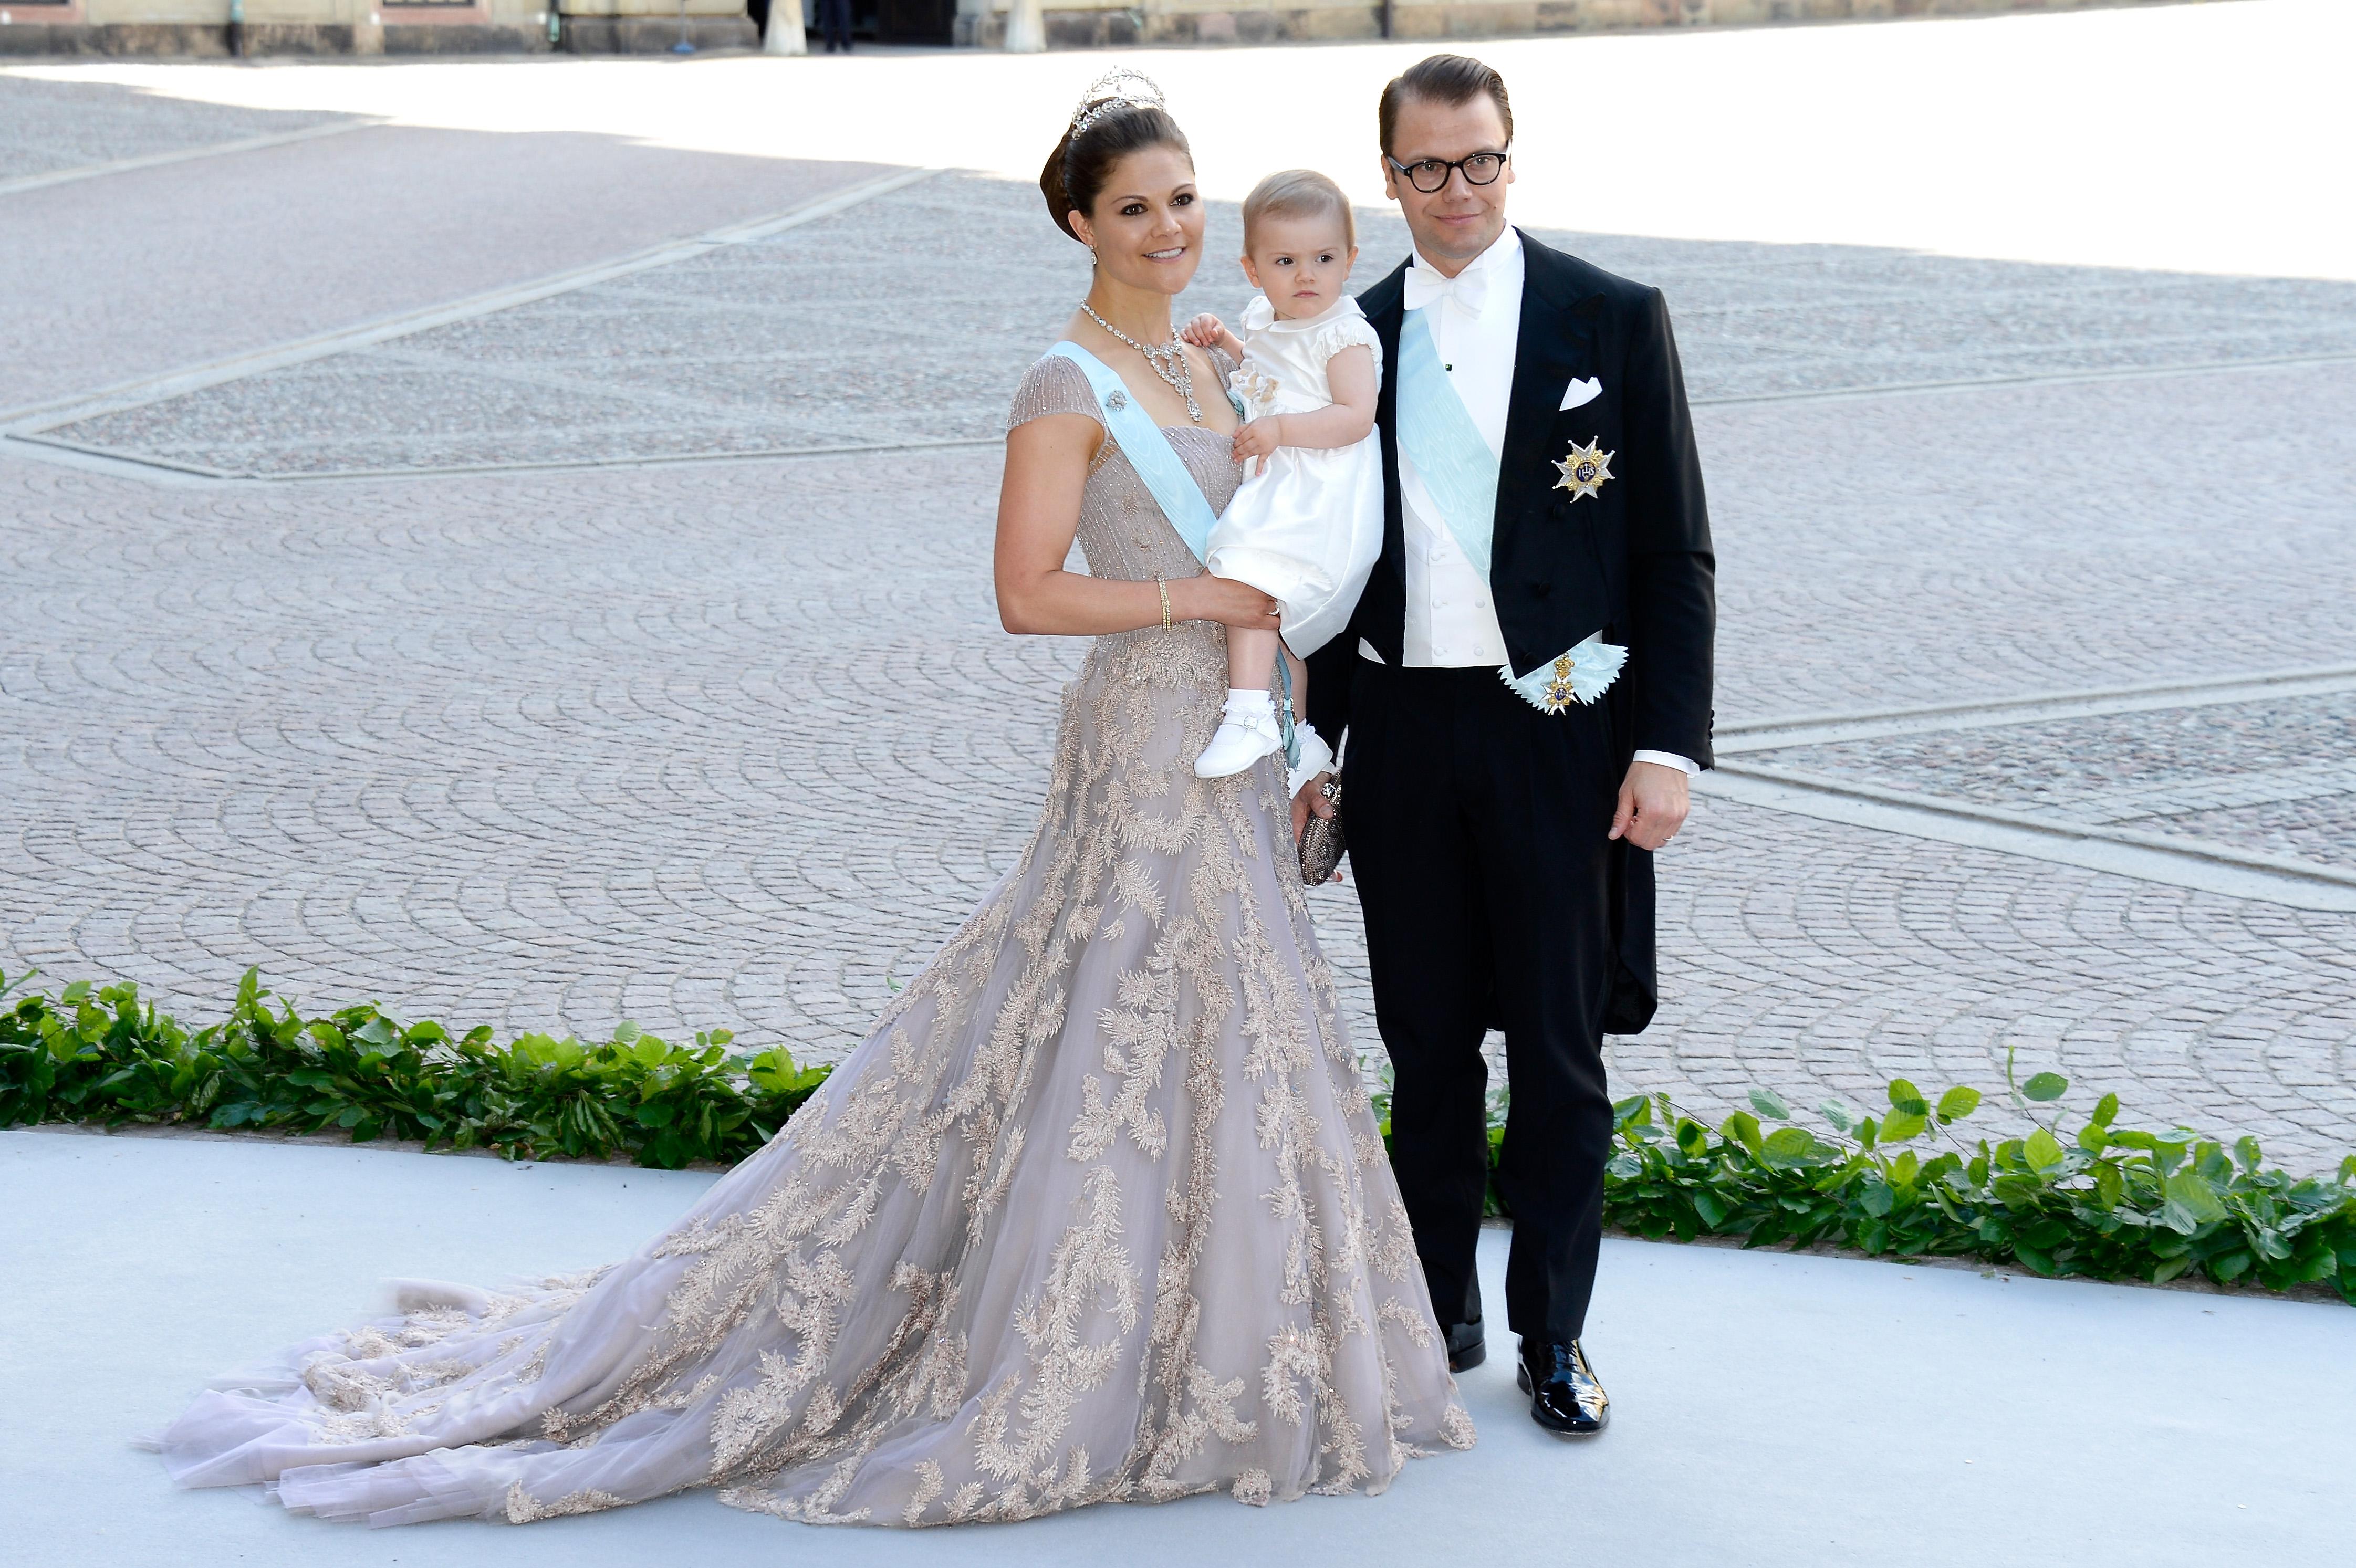 The Wedding Of Princess Madeleine & Christopher O\'Neill | The ...